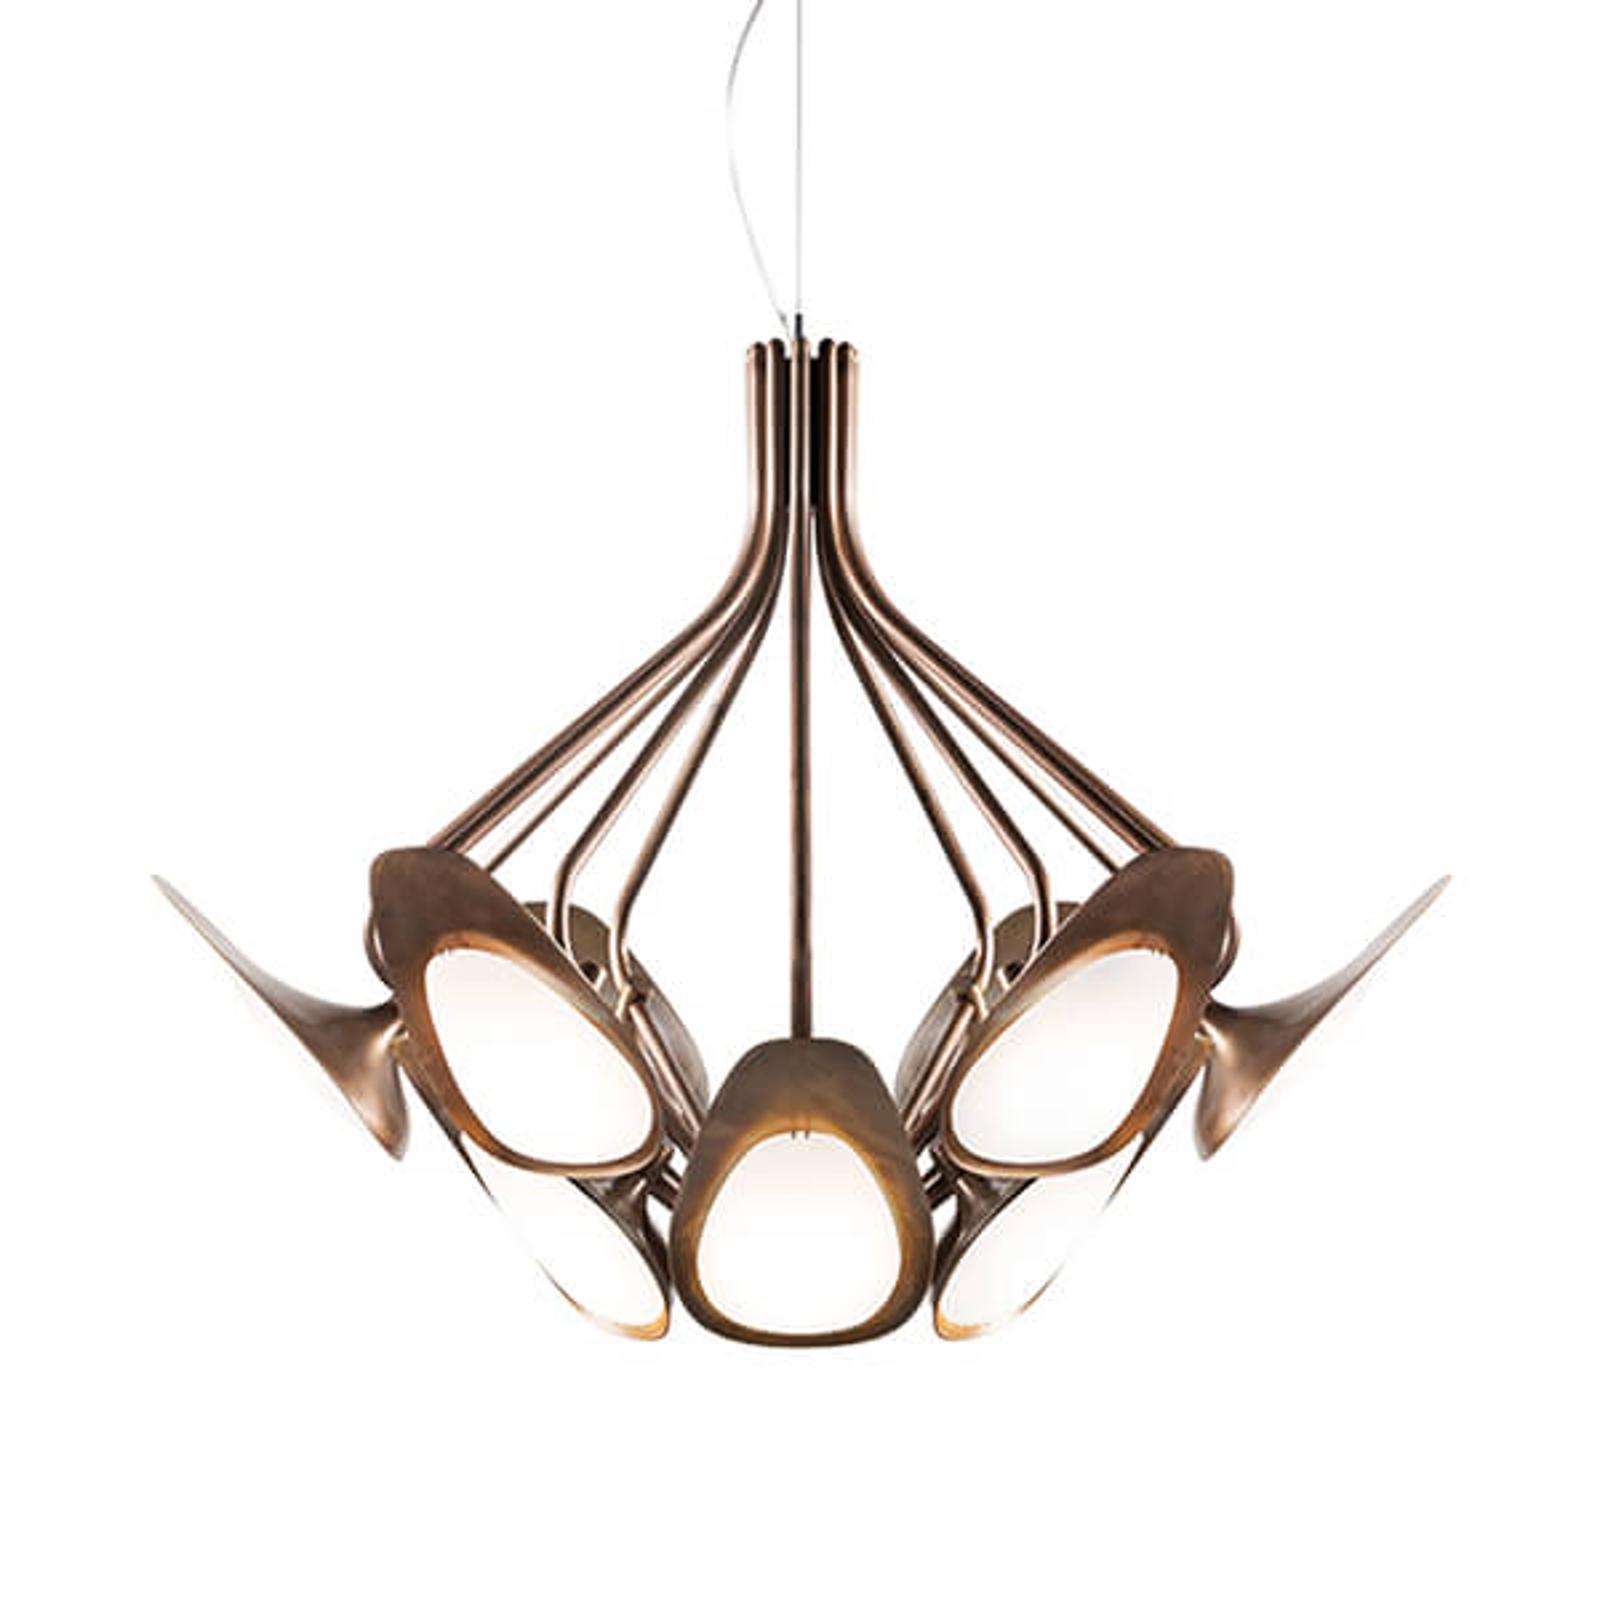 Brązowa lampa wisząca LED PEACOCK